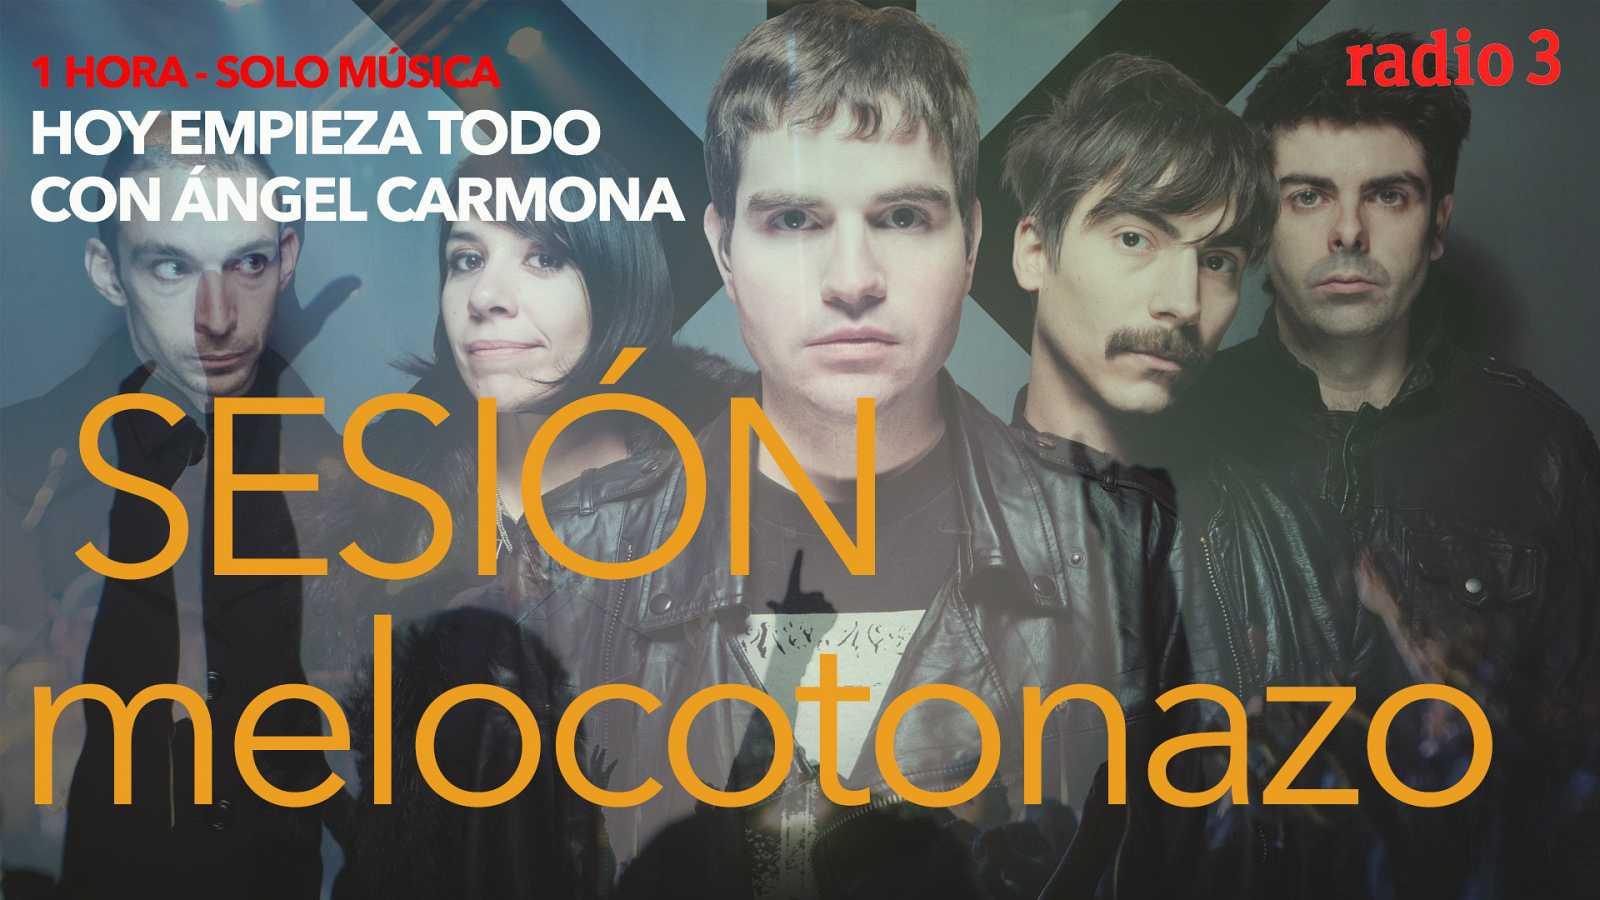 "Hoy empieza todo con Ángel Carmona - ""#SesiónMelocotonazo"": Julieta Venegas, Dorian, Nada Surf...- 24/11/20 - escuchar ahora"